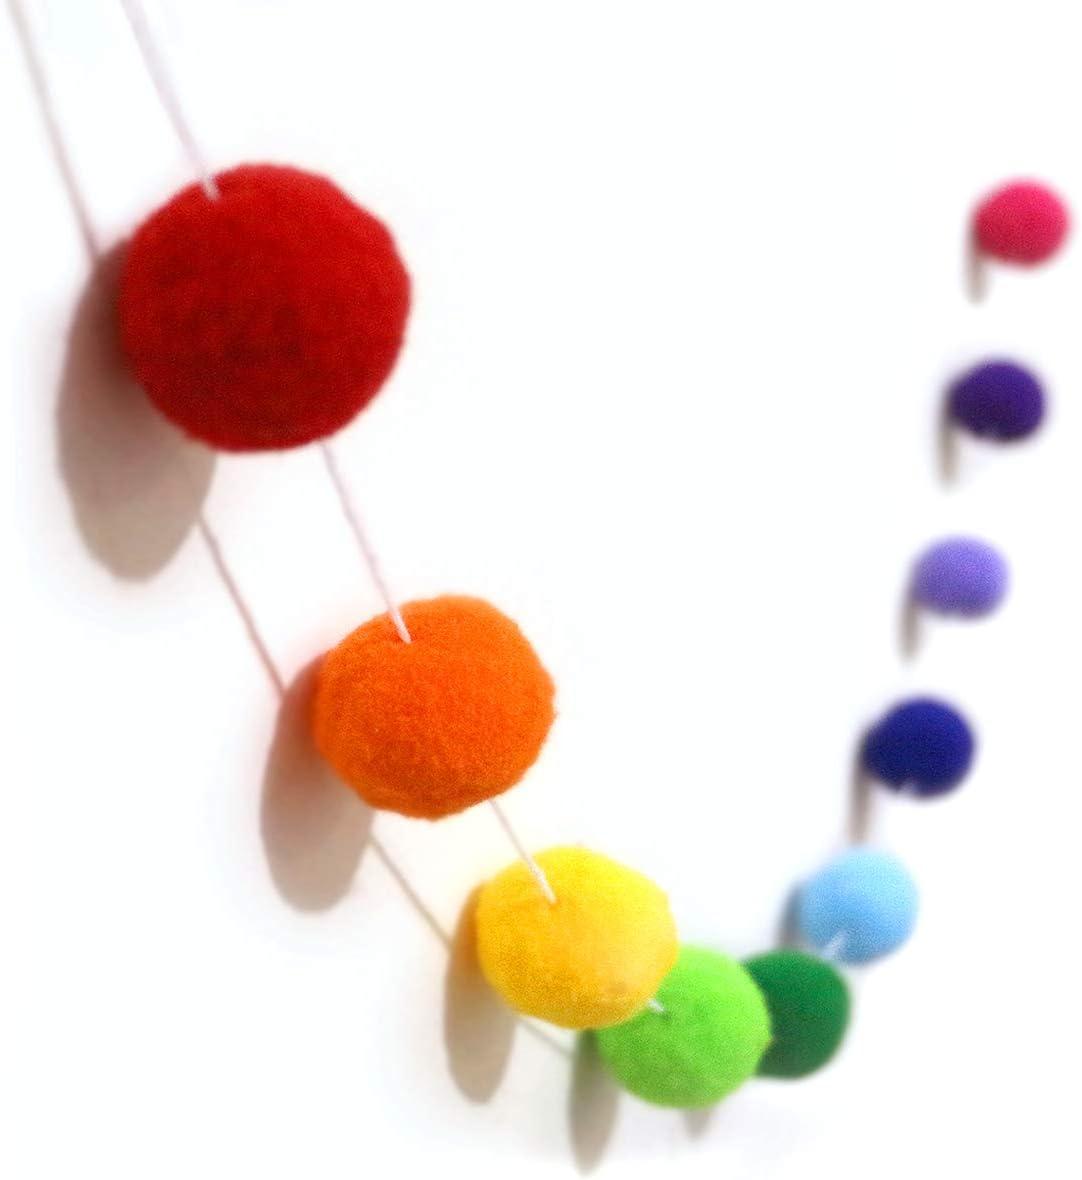 Bining Felt Ball 30mm 30 Balls Christmas Tassel Garland Pom Pom Ball String Ba 78in(2M) (Colorful Felt Ball 30pcs)